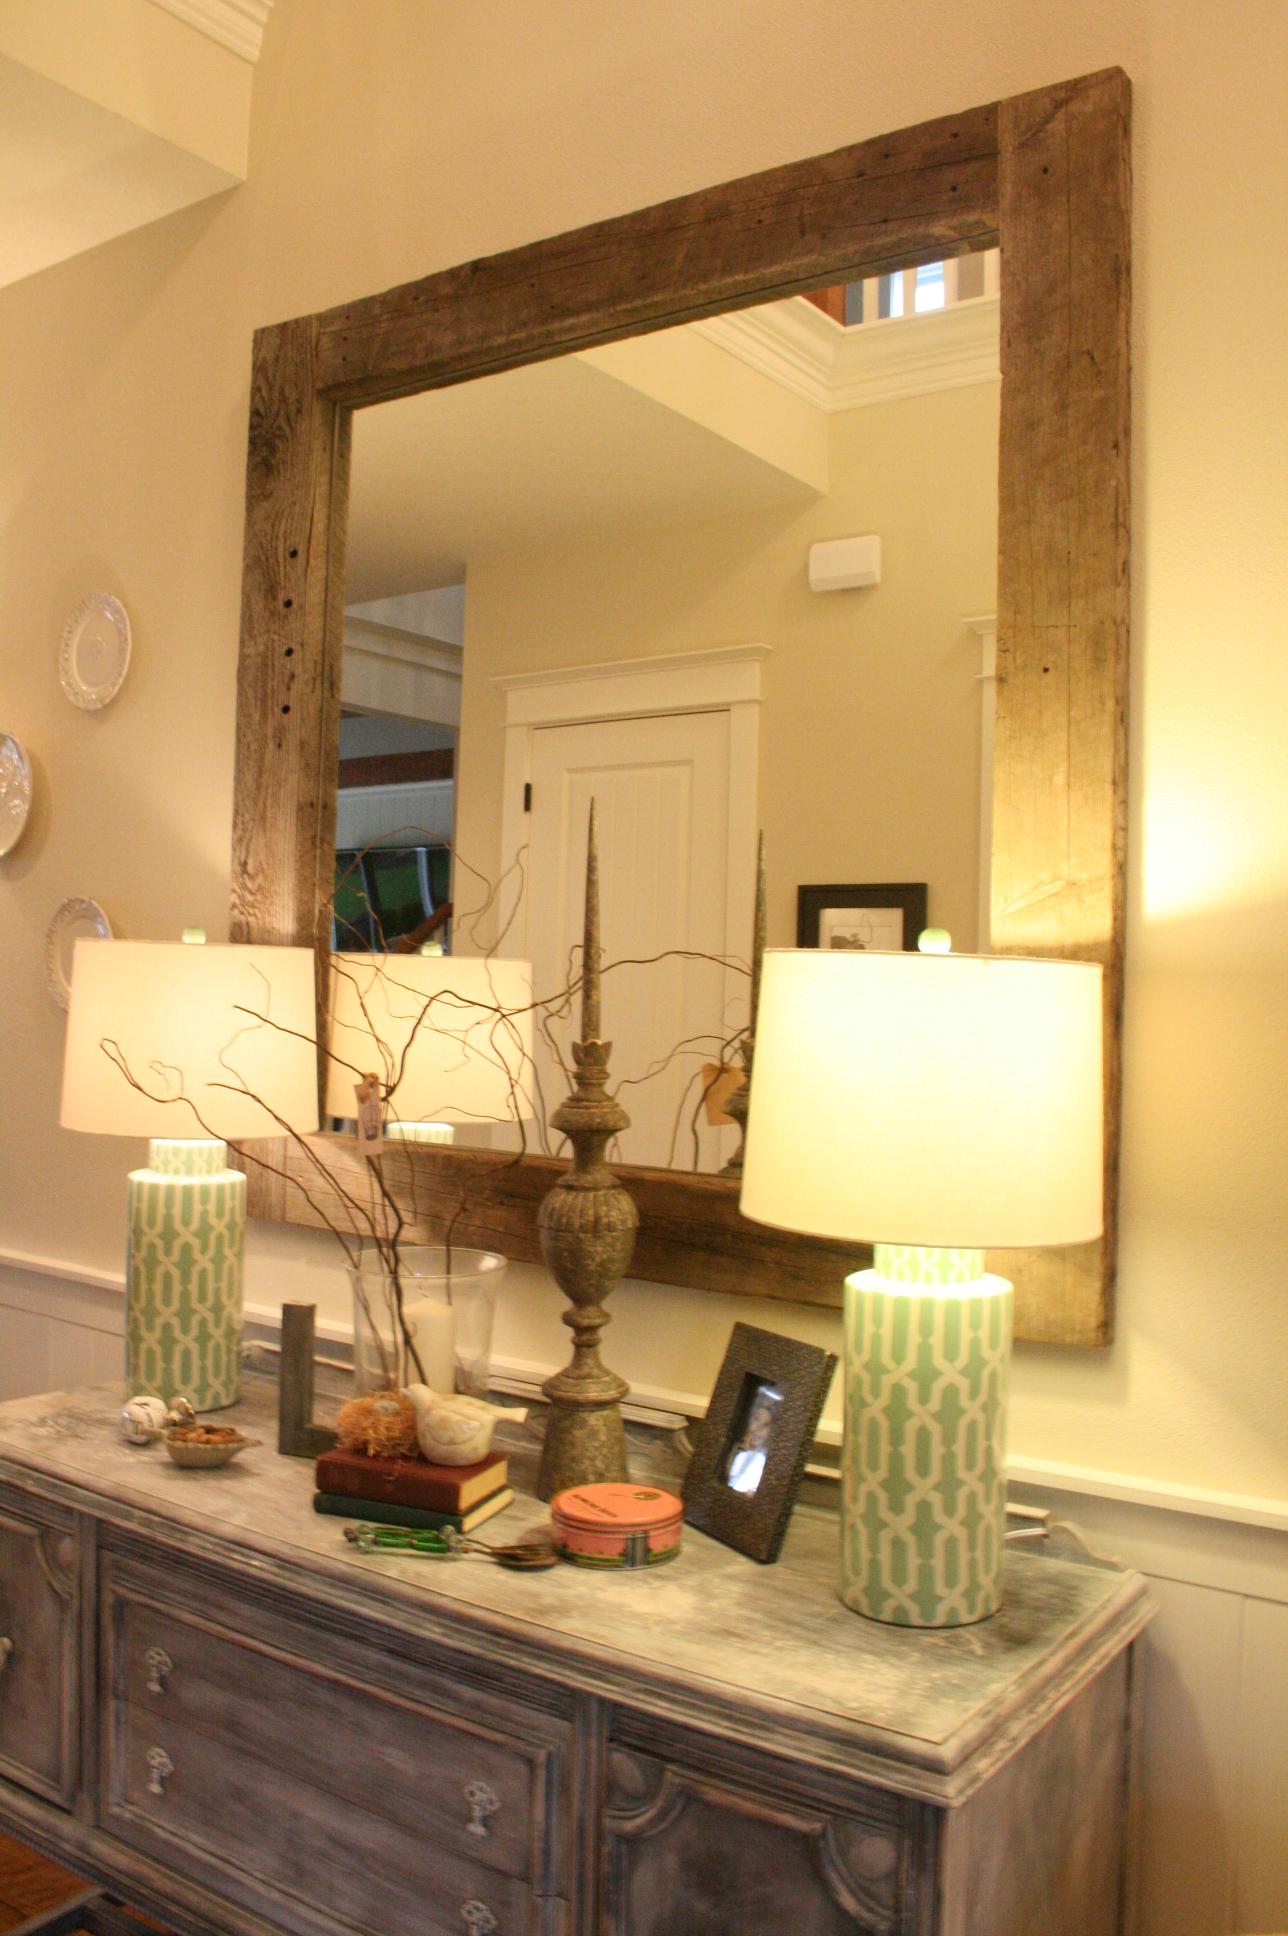 Barn Wood Mirror Rustic Home Decor: DIY Barn Wood Mirror, Wood TV Frame, Whitewash Walls